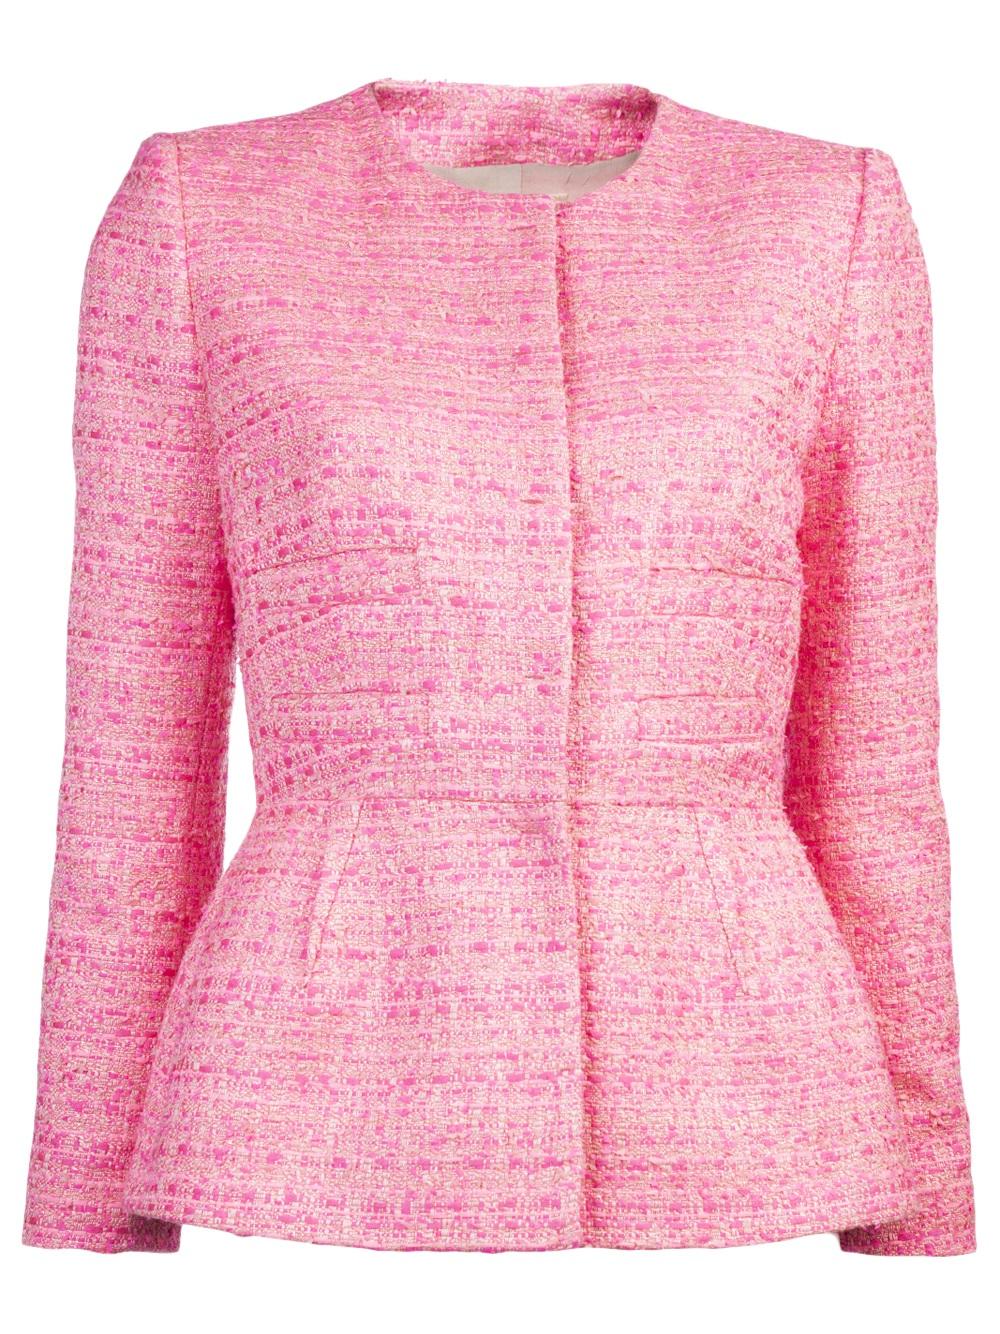 Giambattista valli Fluorescent Tweed Jacket in Pink | Lyst